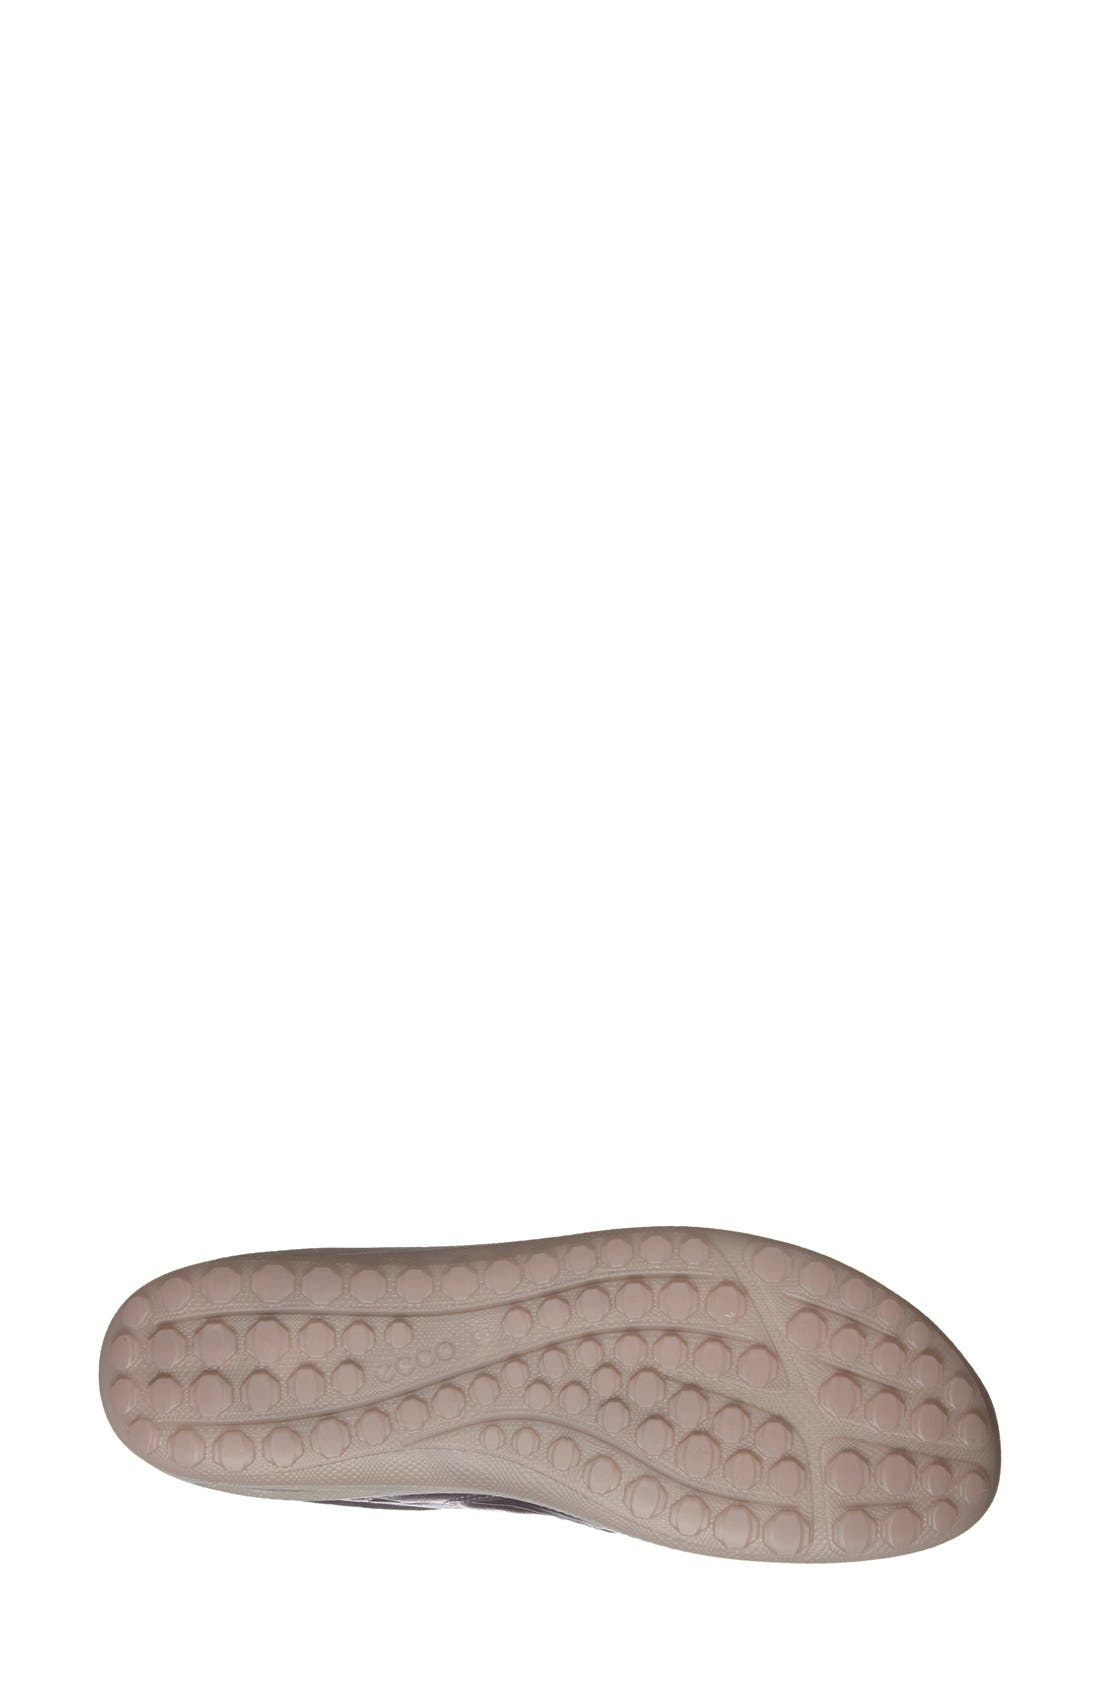 'Biom Grip Lite' Sneaker,                             Alternate thumbnail 2, color,                             023